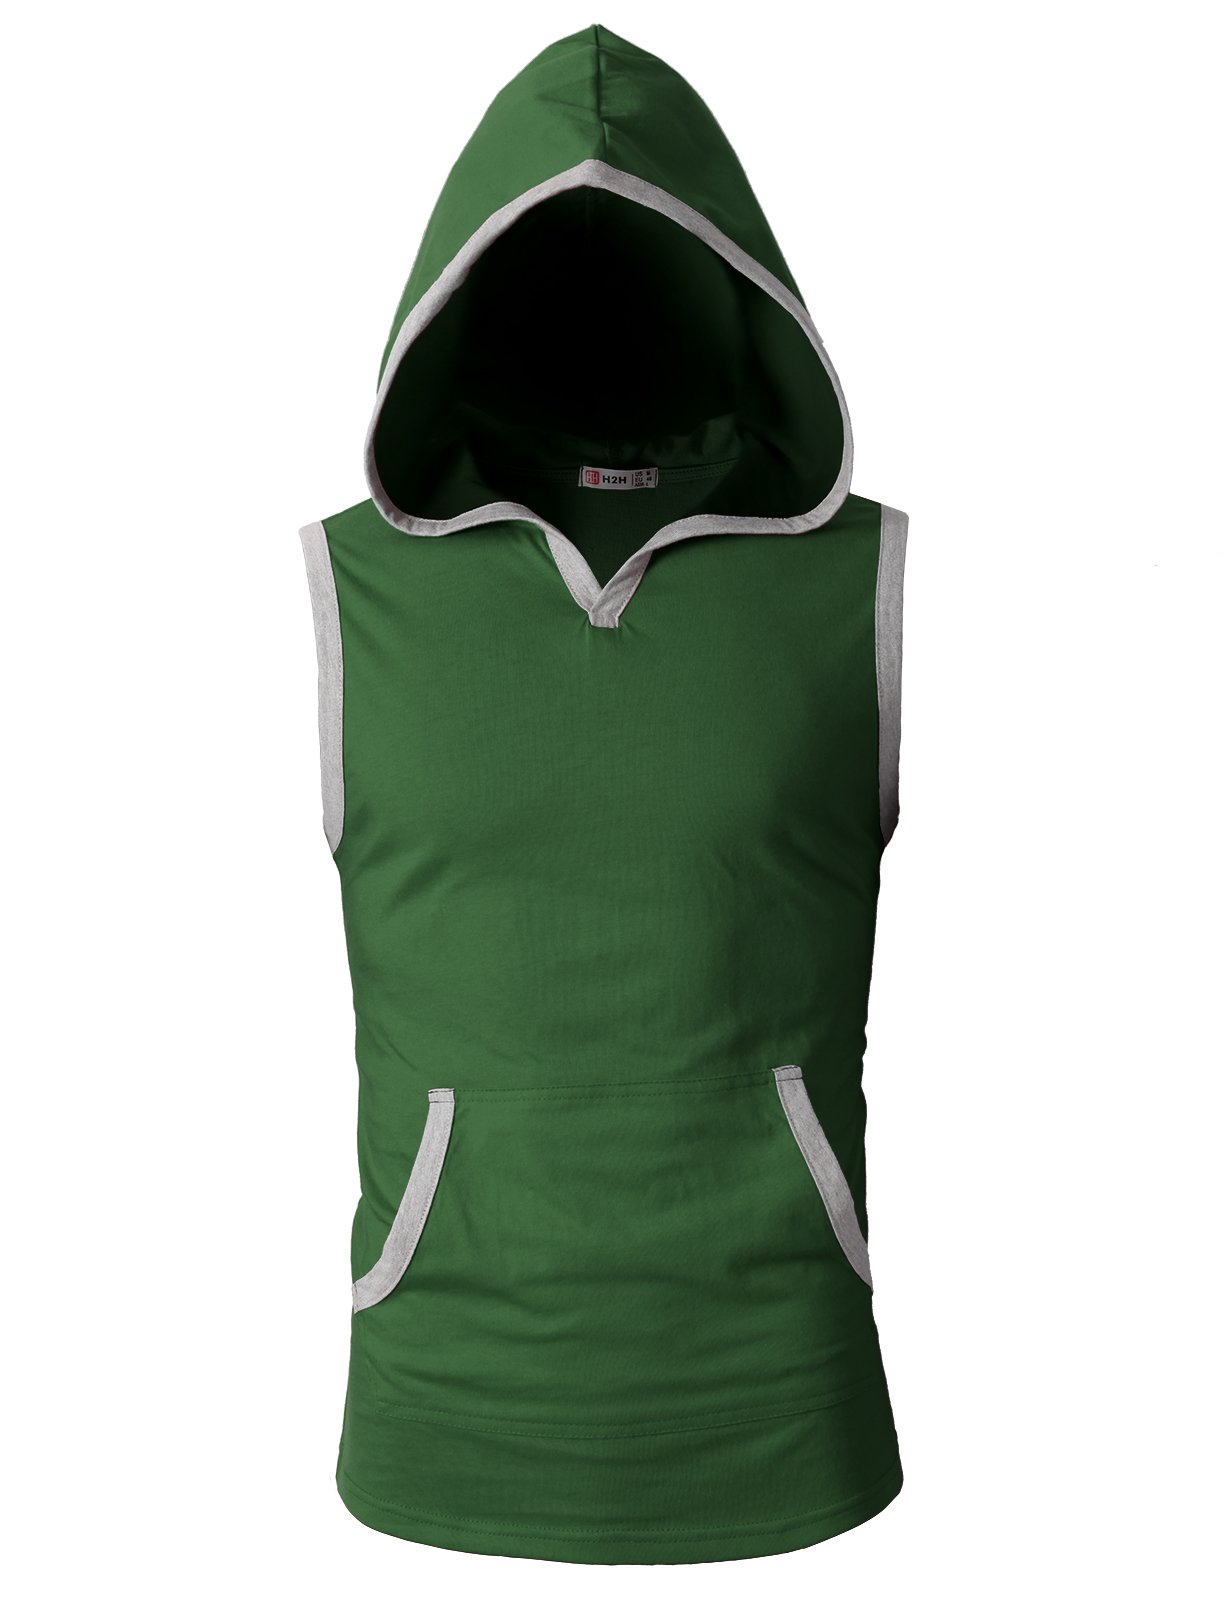 H2H Men's Casual Hooded Sleeveless Tank Tops Cotton Sleeveless T-Shirts Green US S/Asia M (CMTTK015)